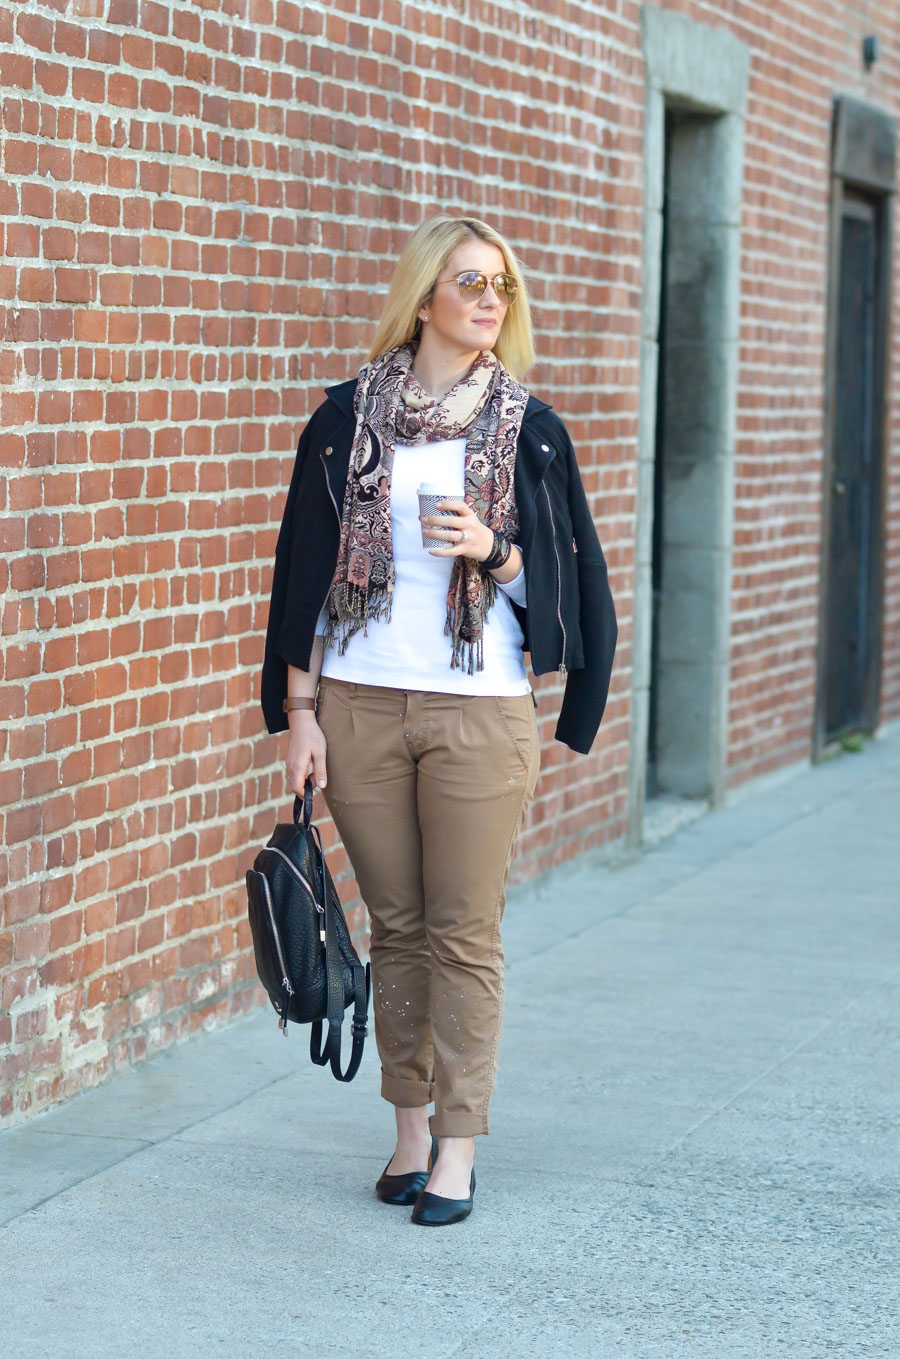 Women's Khaki Pants Outfit Idea for Spring w. Black Flats